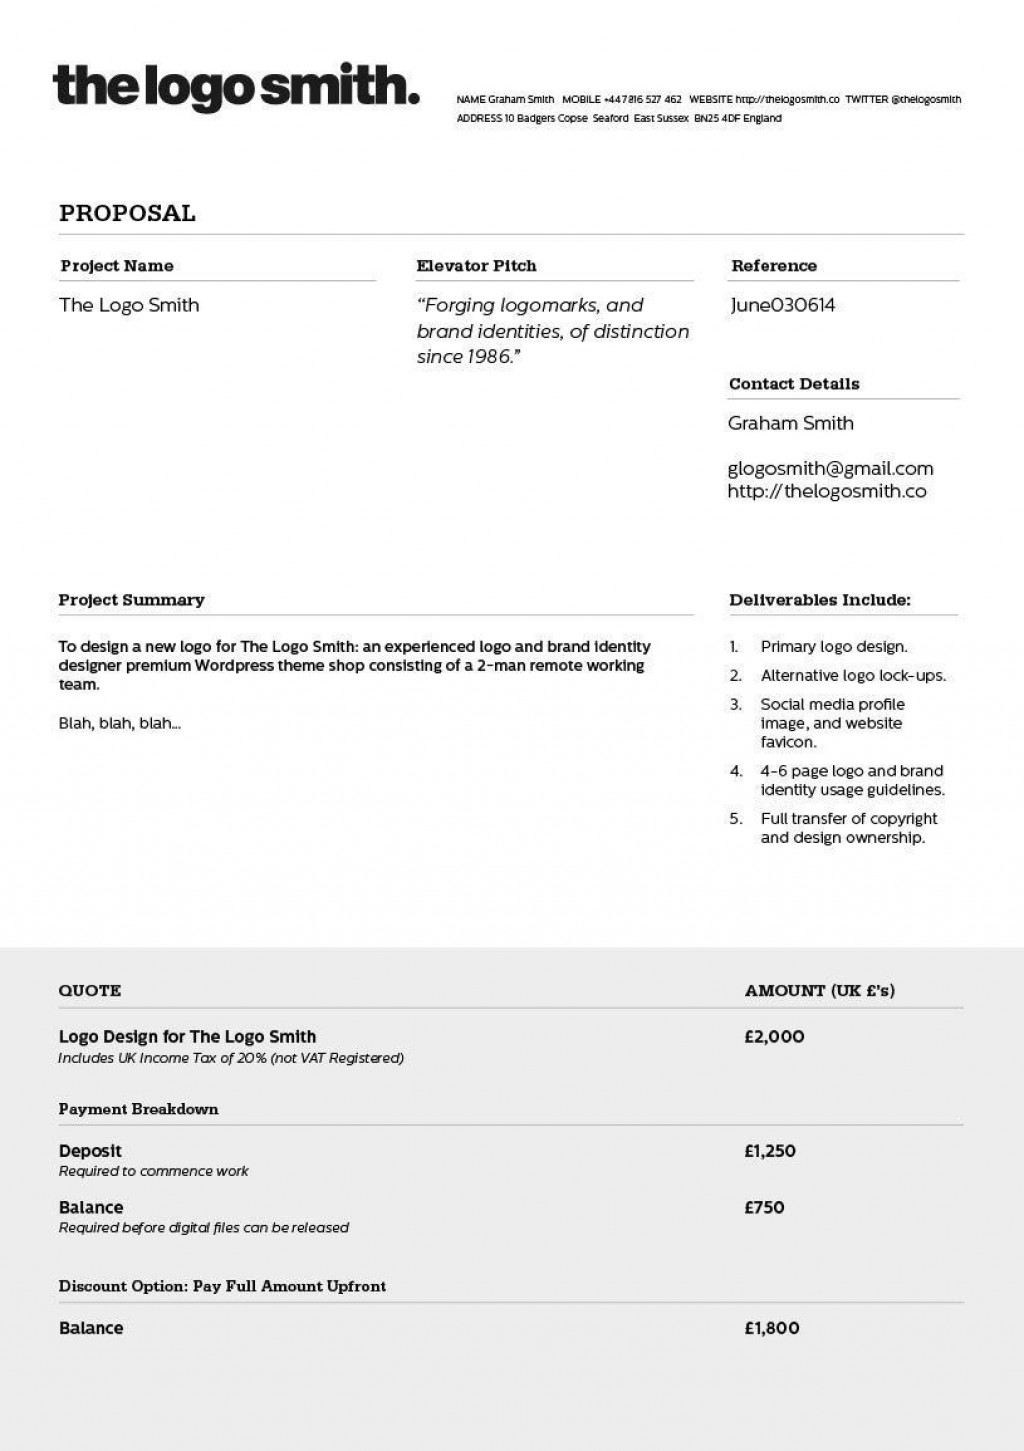 006 Unbelievable Freelance Web Developer Proposal Template Inspiration Large